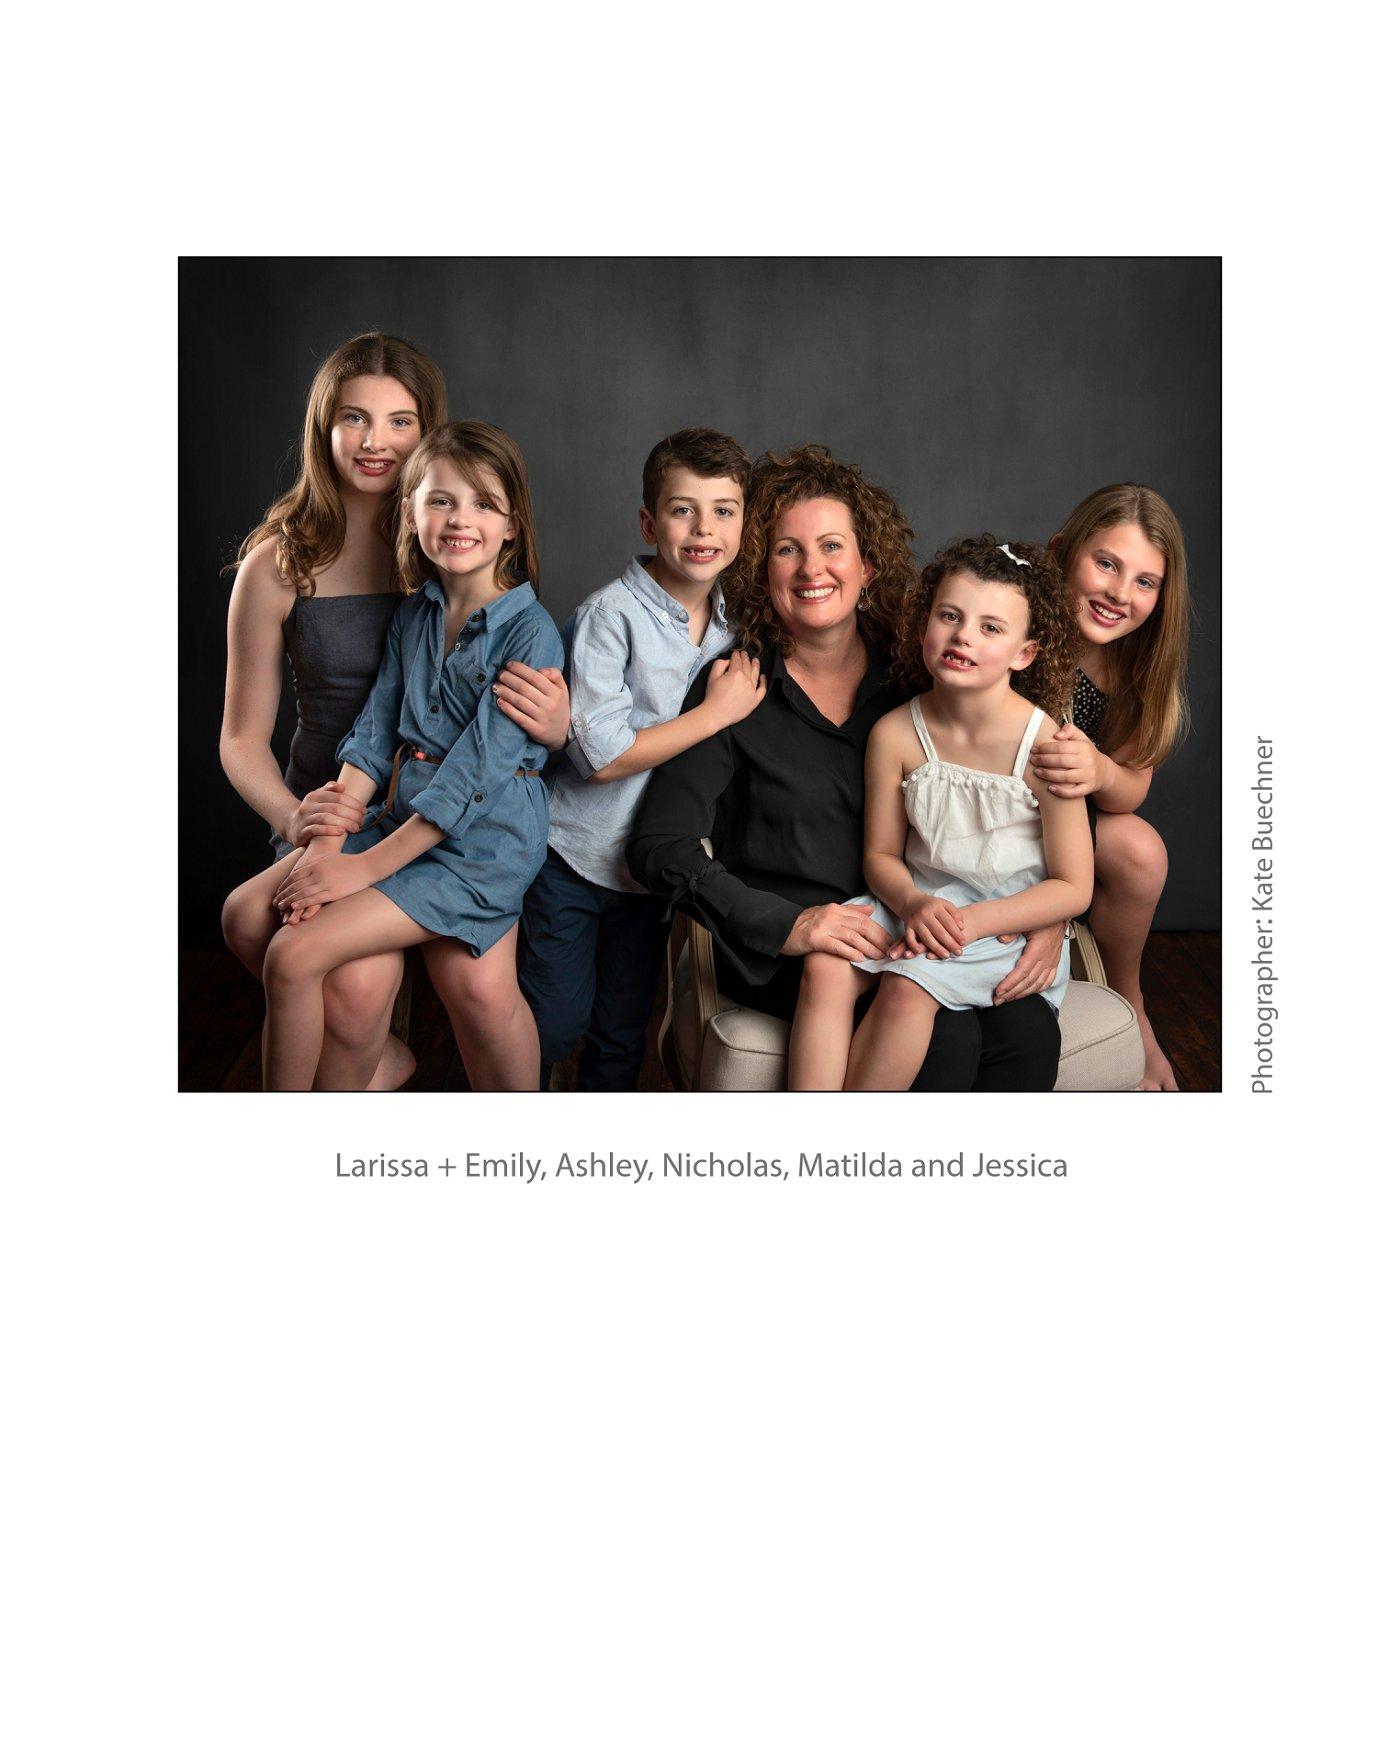 family-photographer-sydney (1).jpg